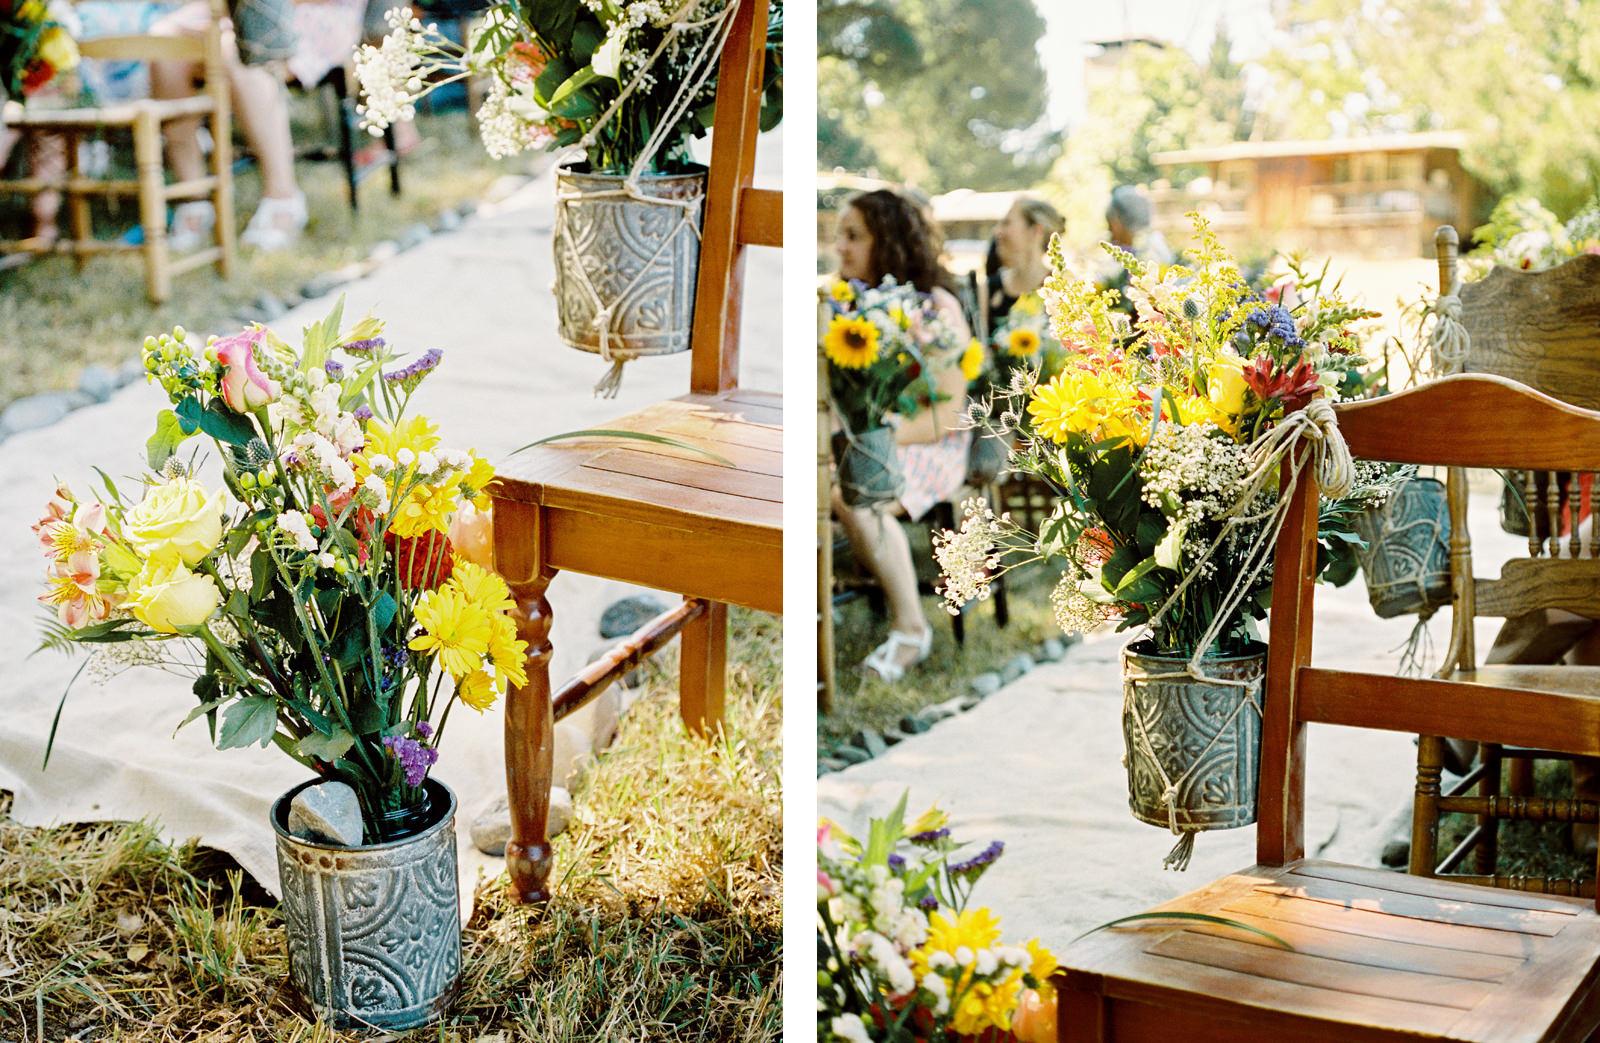 rivers-bend-retreat-wedding-014 RIVER'S BEND RETREAT WEDDING